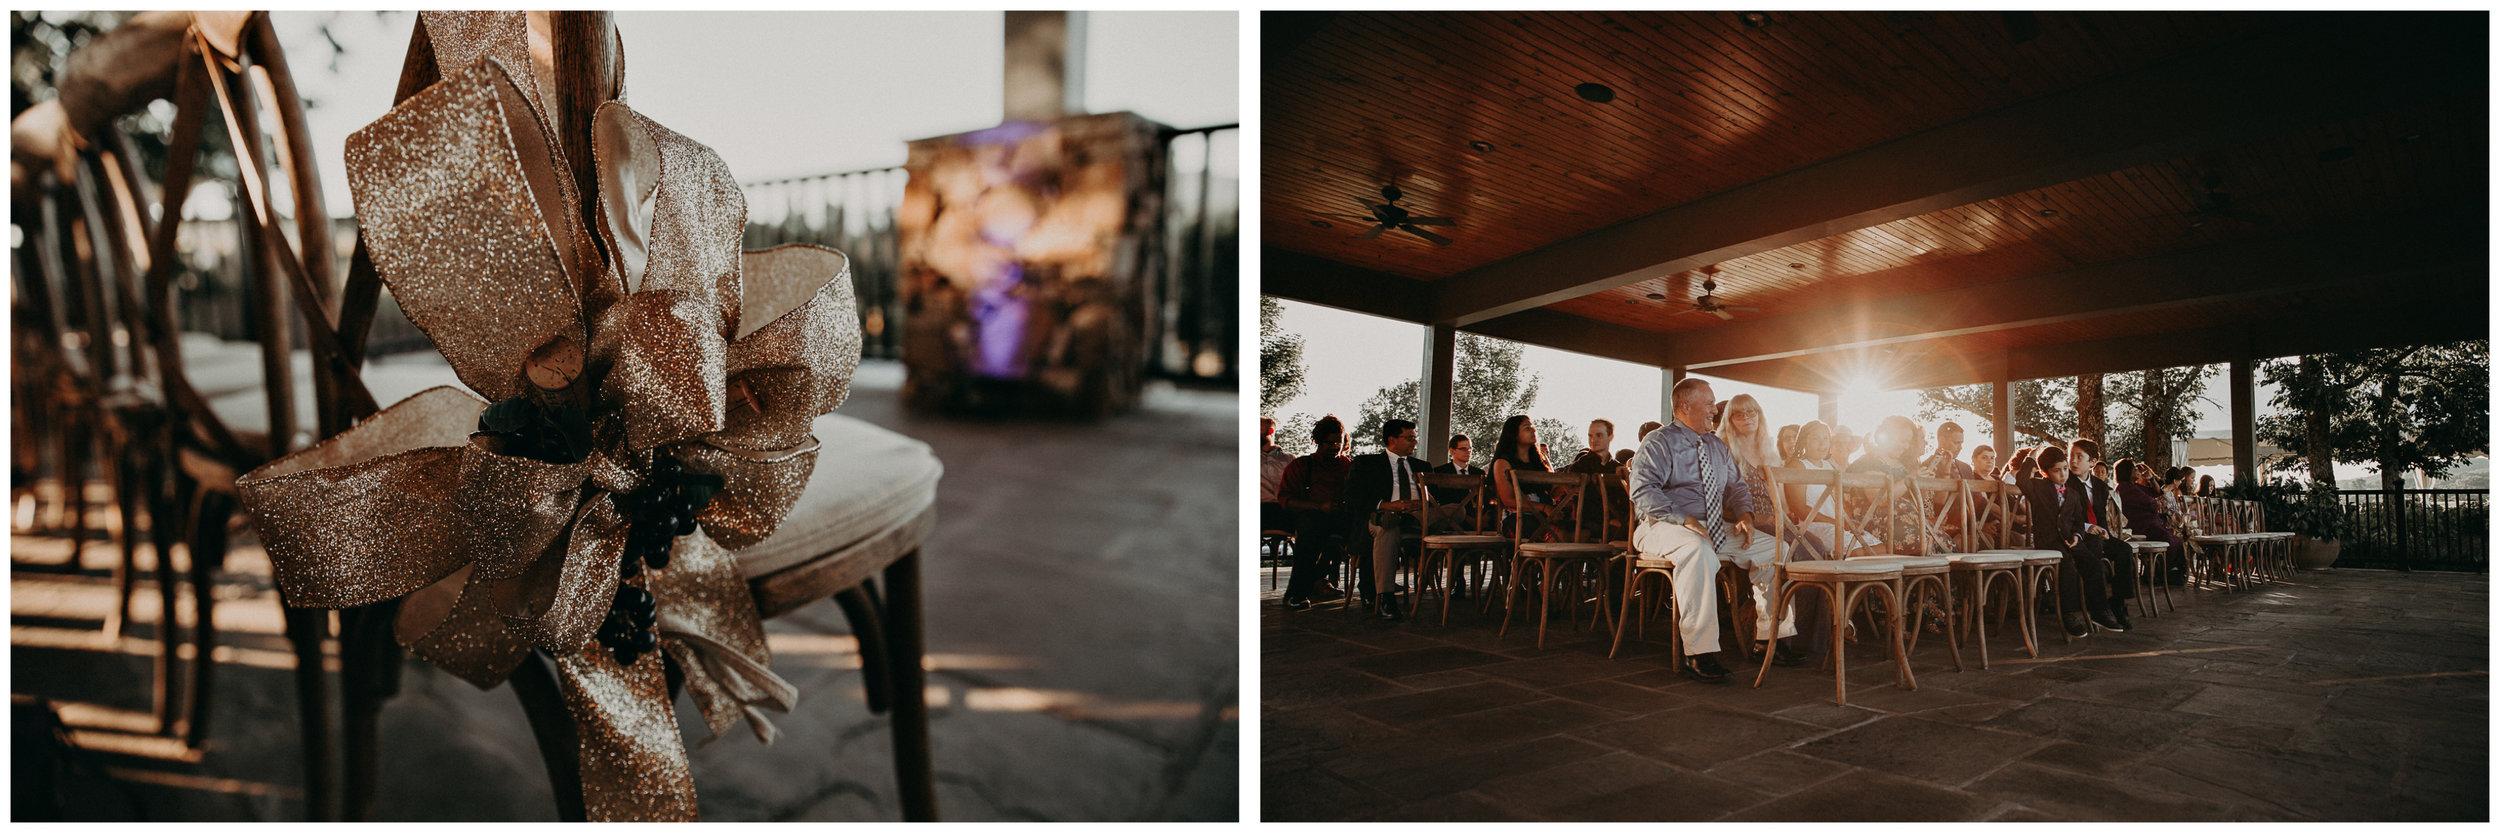 67- Kaya_vineyard_dahlonega_wedding_venue_ceremony_aline_marin_photography.jpg